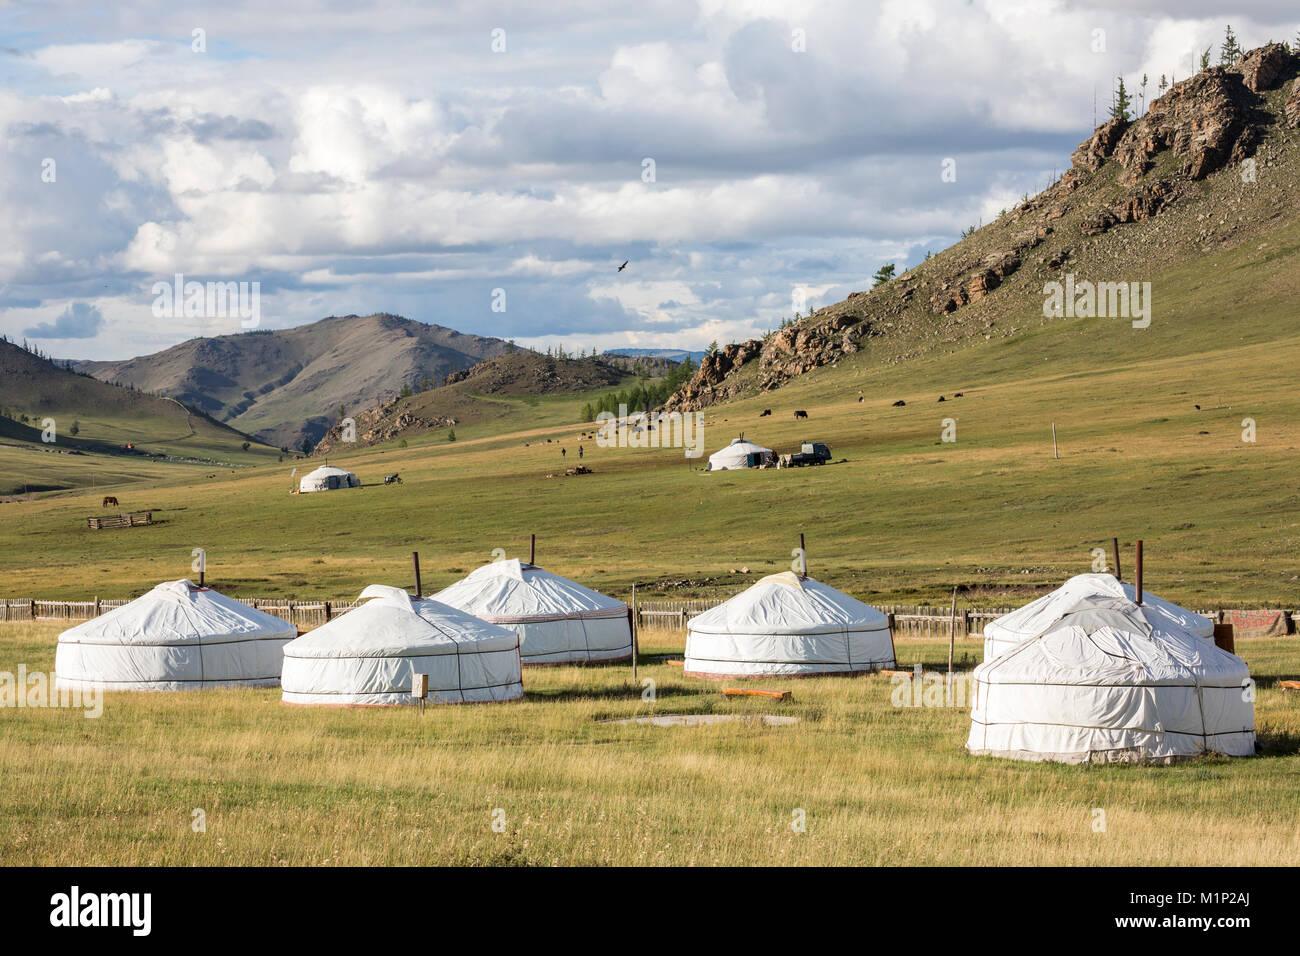 Tourist ger camp e Khangai montagne, Burentogtokh distretto, Hovsgol provincia, Mongolia, Asia Centrale, Asia Immagini Stock